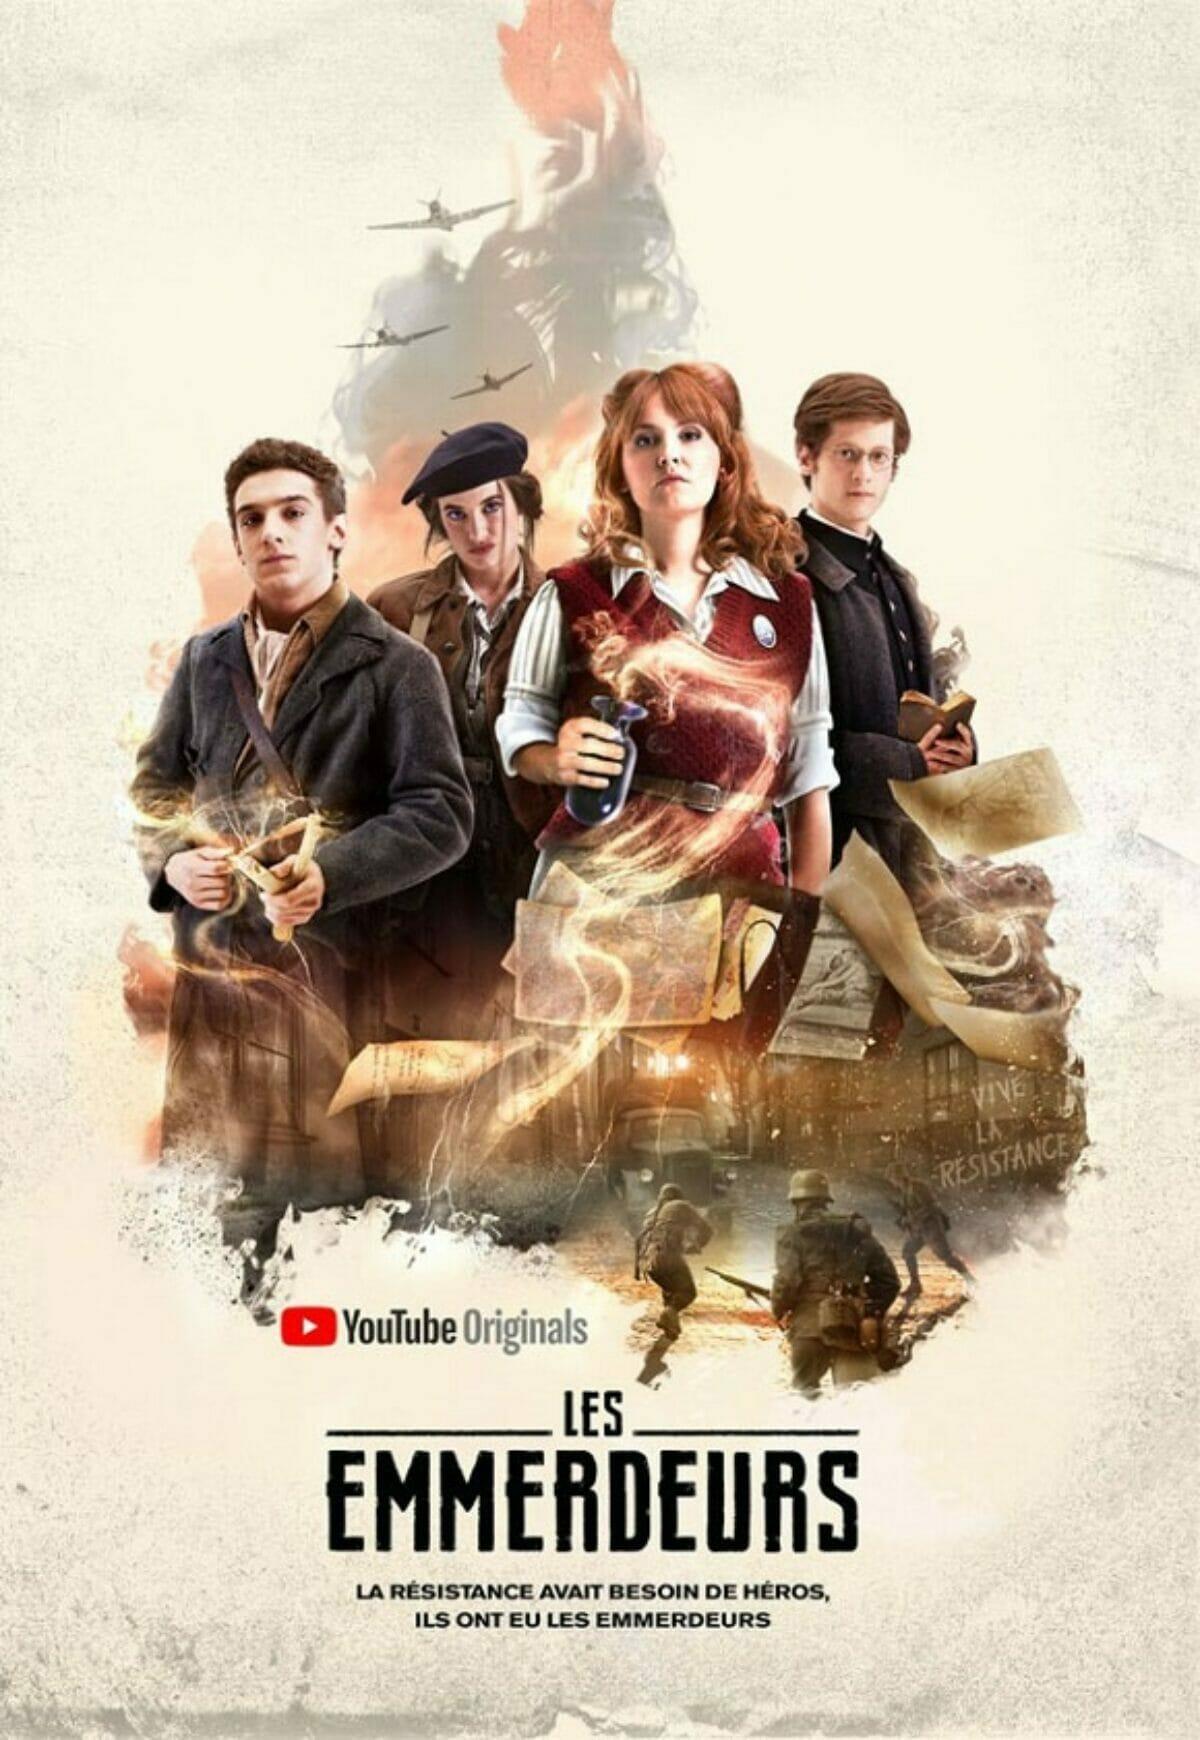 Les-Emmerdeurs-poster